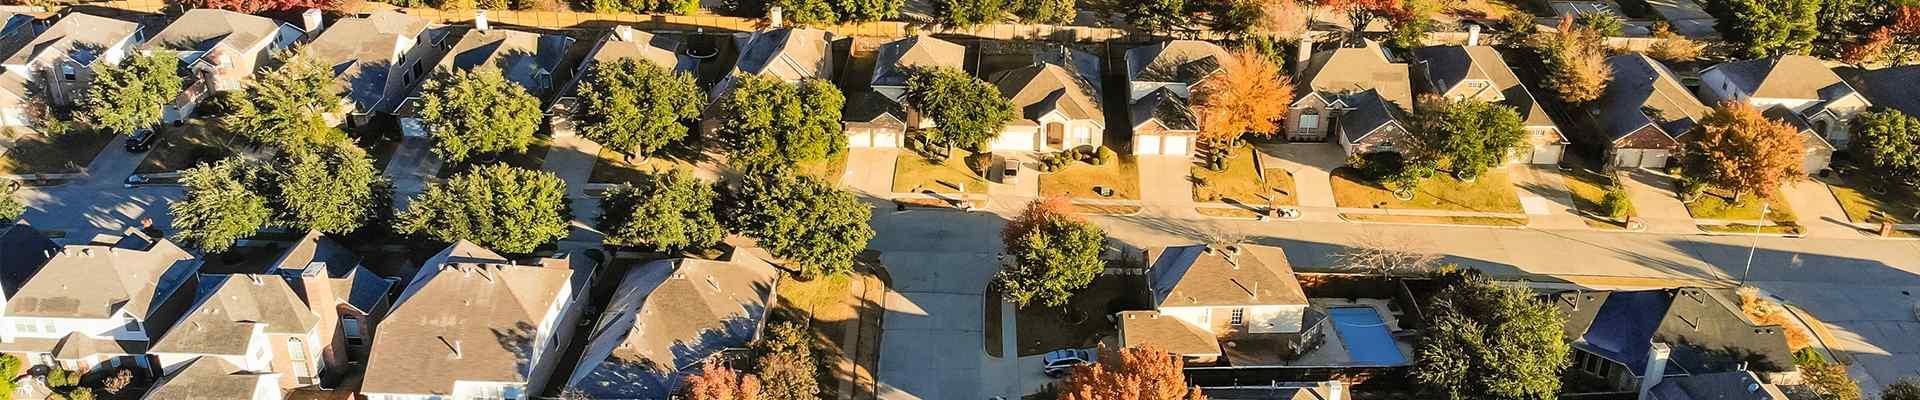 suburban homes in justin texas